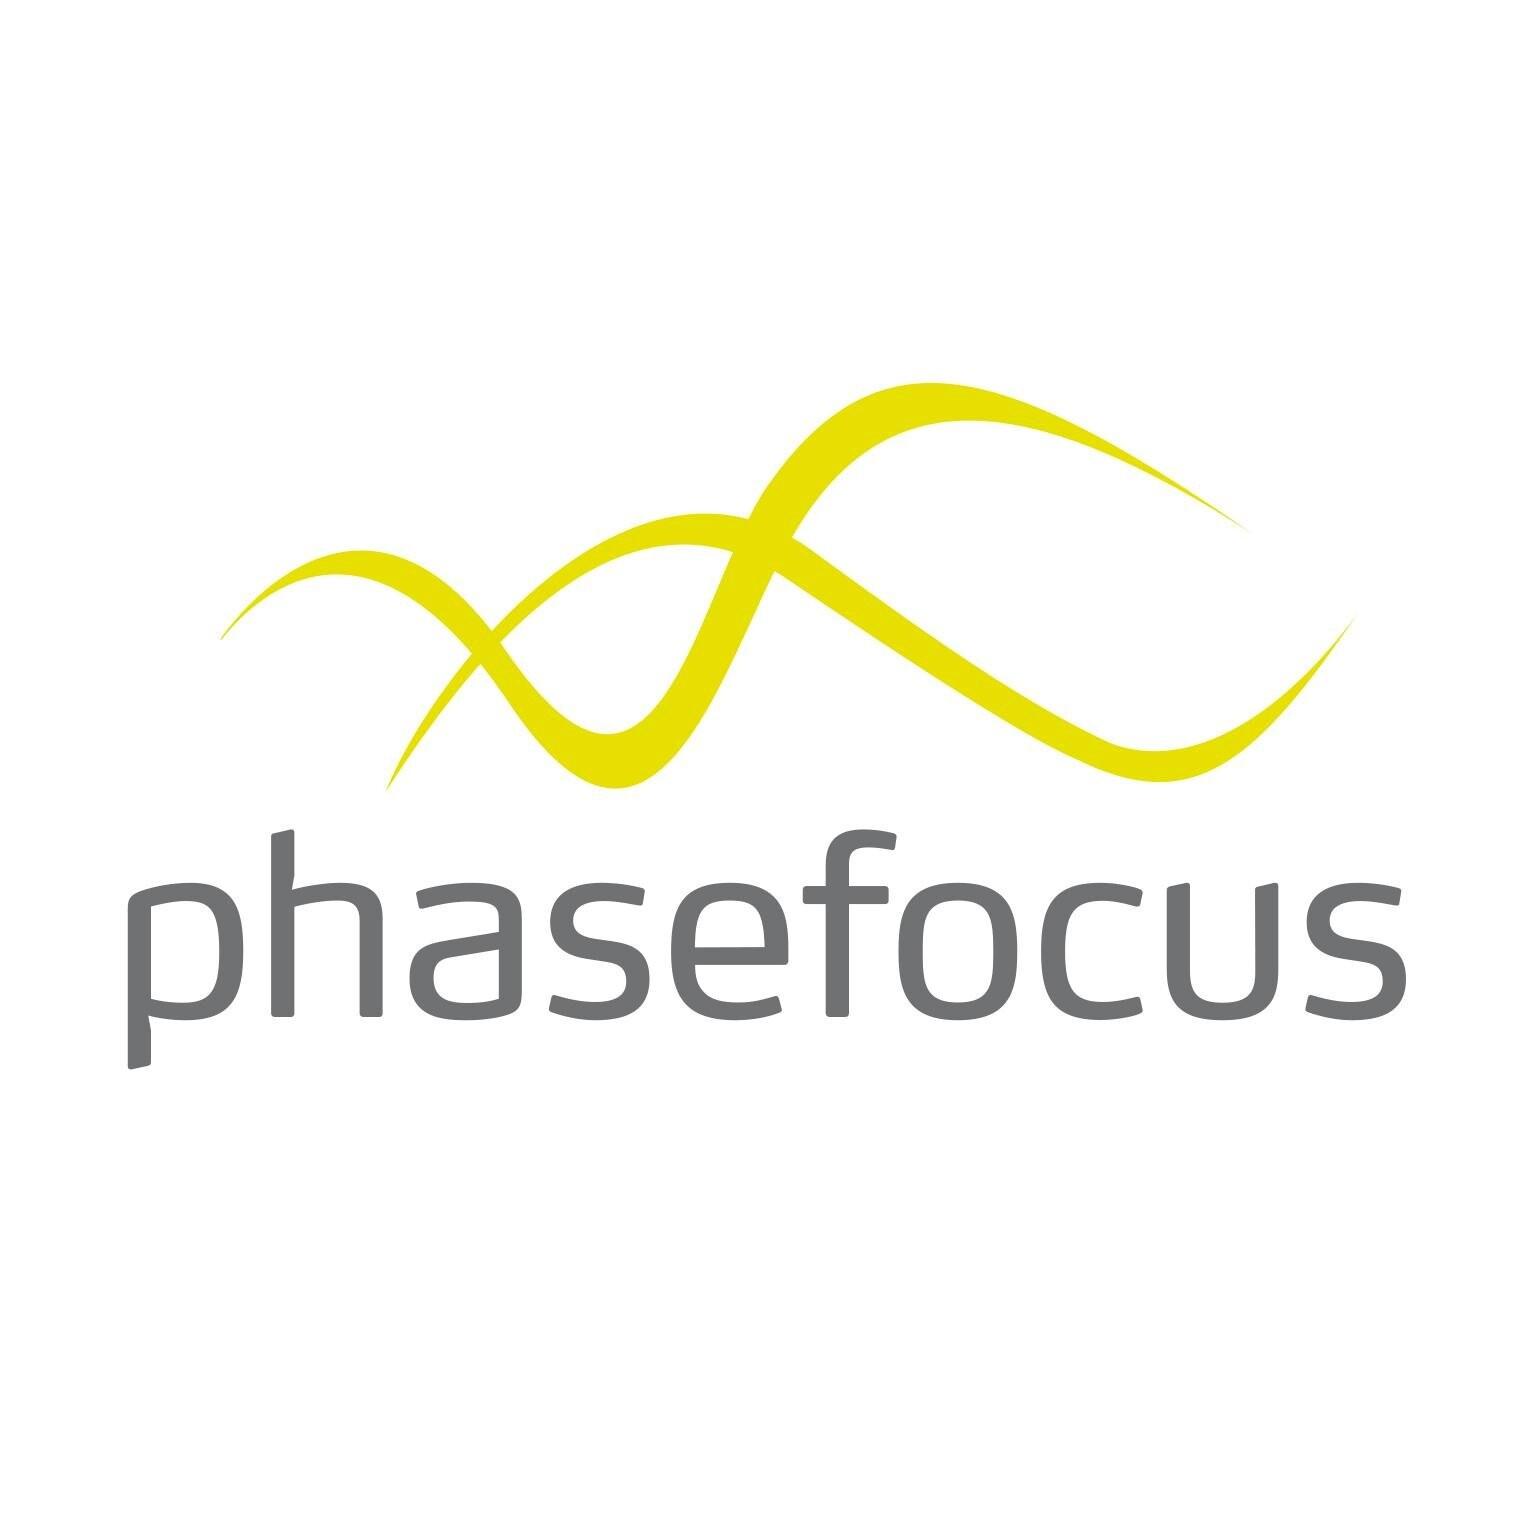 Phase Focus